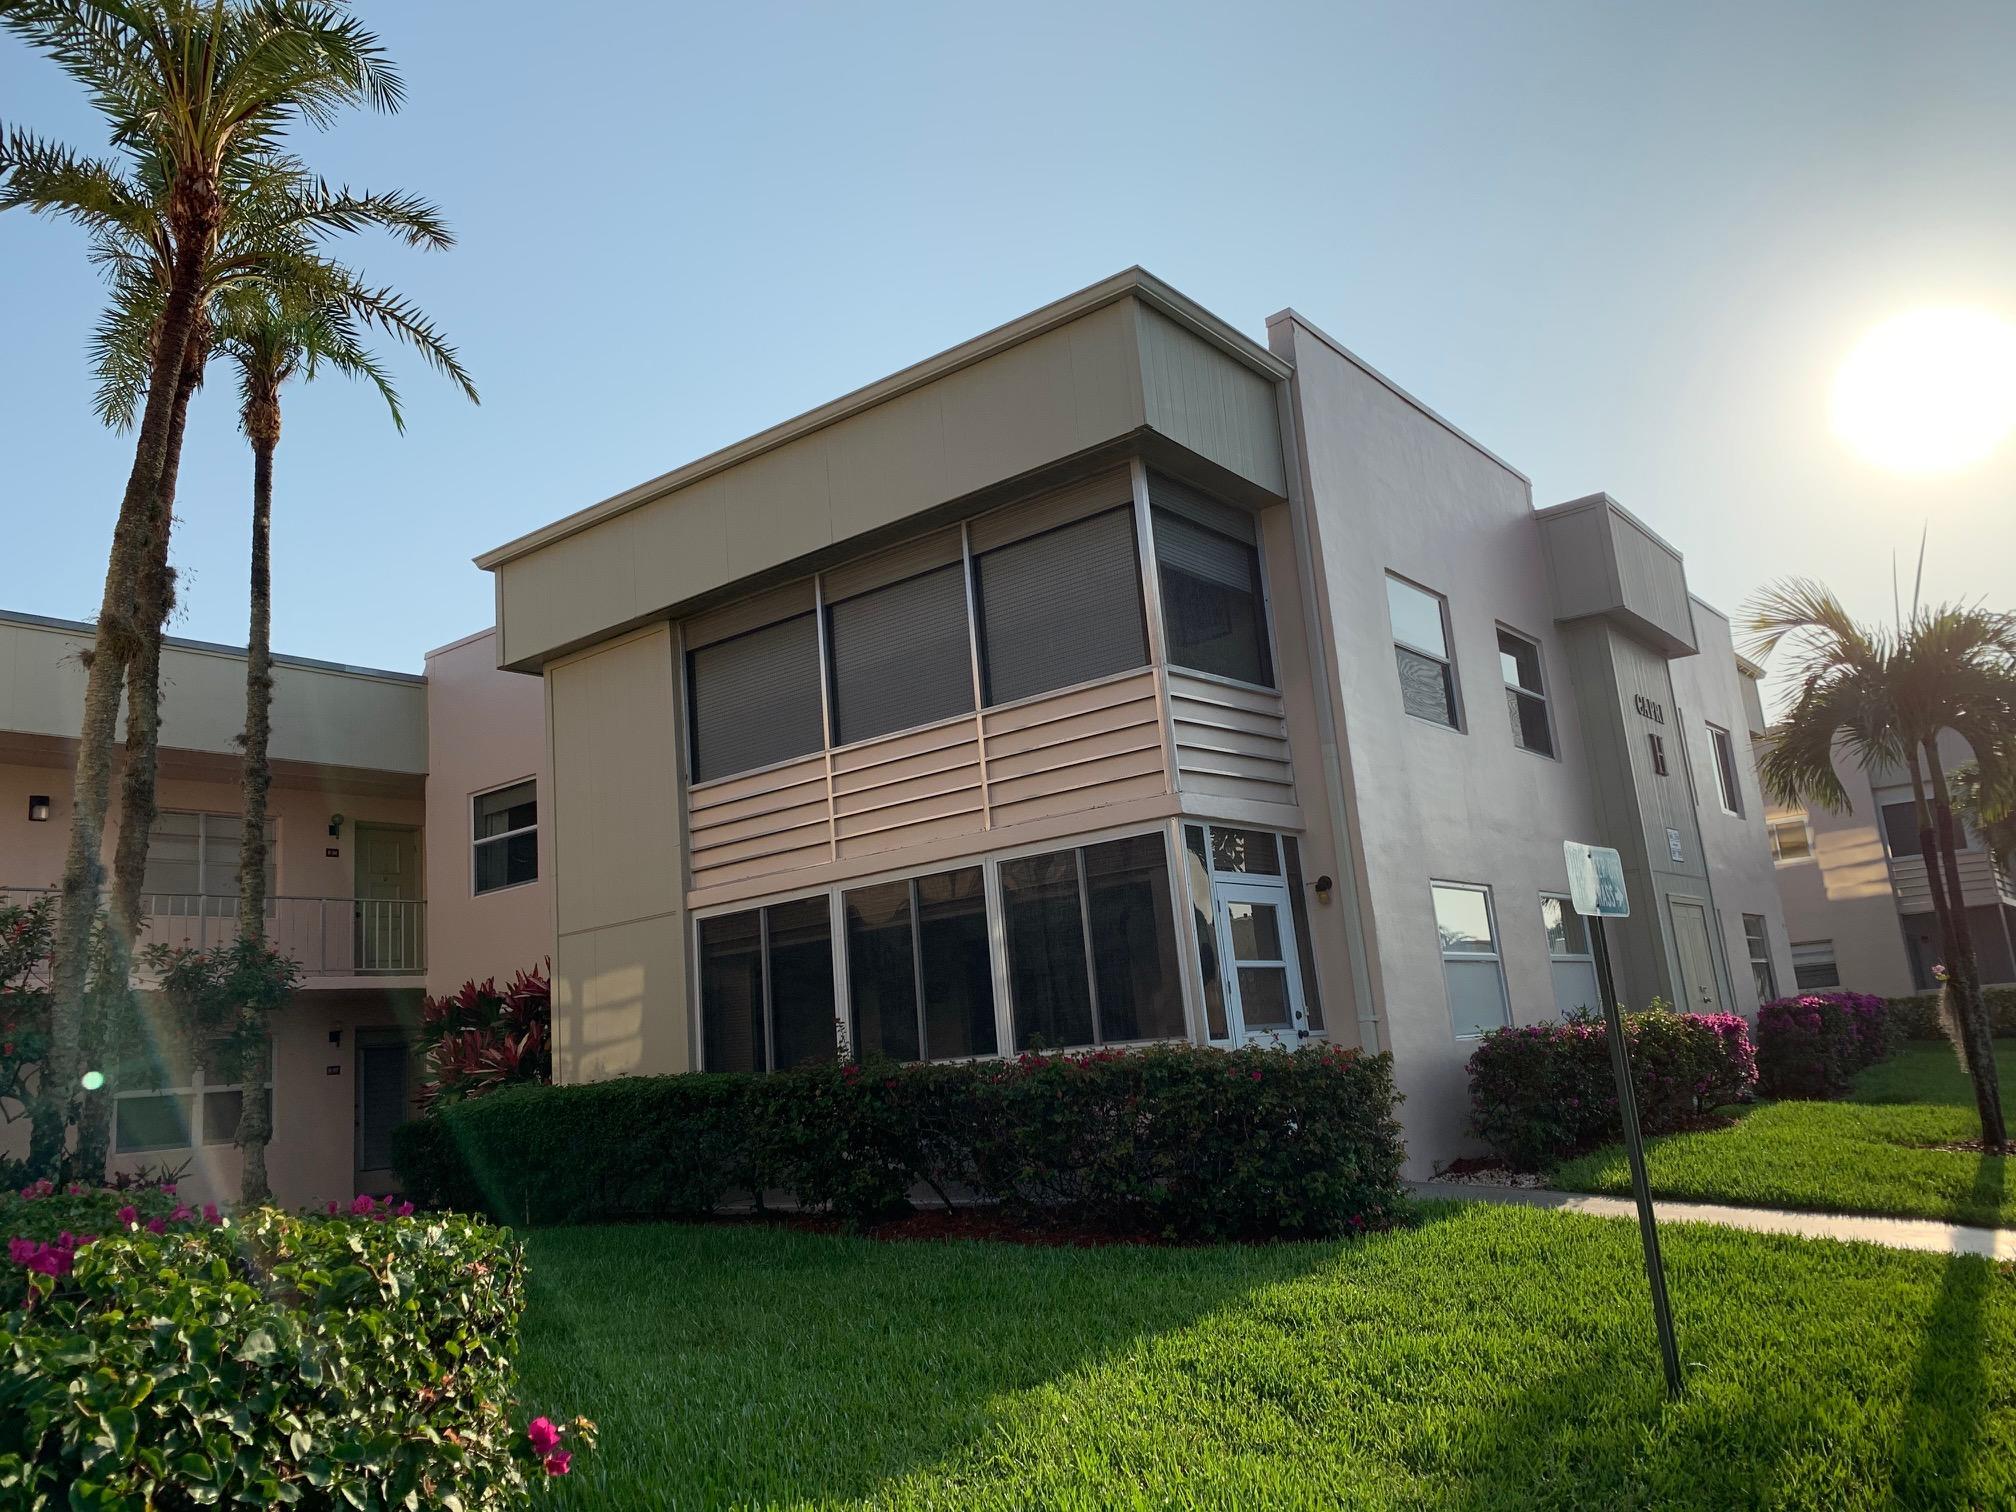 380 Capri H, Delray Beach, Florida 33484, 2 Bedrooms Bedrooms, ,2 BathroomsBathrooms,F,Condominium,Capri H,RX-10617186